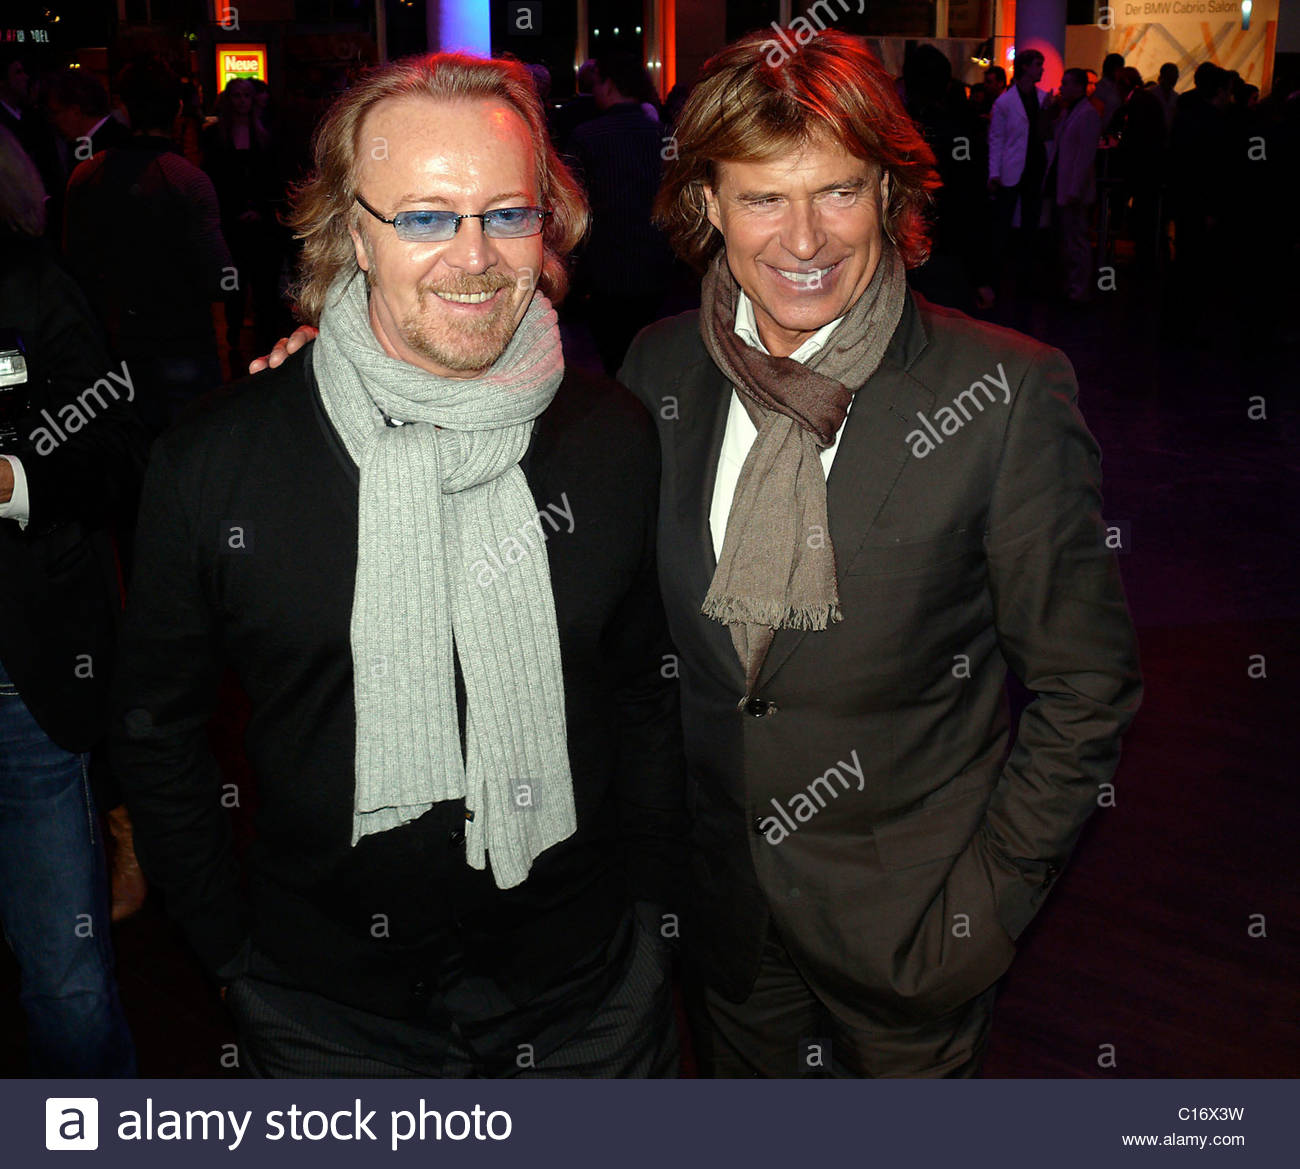 "Umberto Tozzi, Hansi Hinterseer Aftershow-Party ""Carmen Nebel"" at BMW Kurfuerstendamm Berlin, Germany - 14.03.09 Stock Photo"